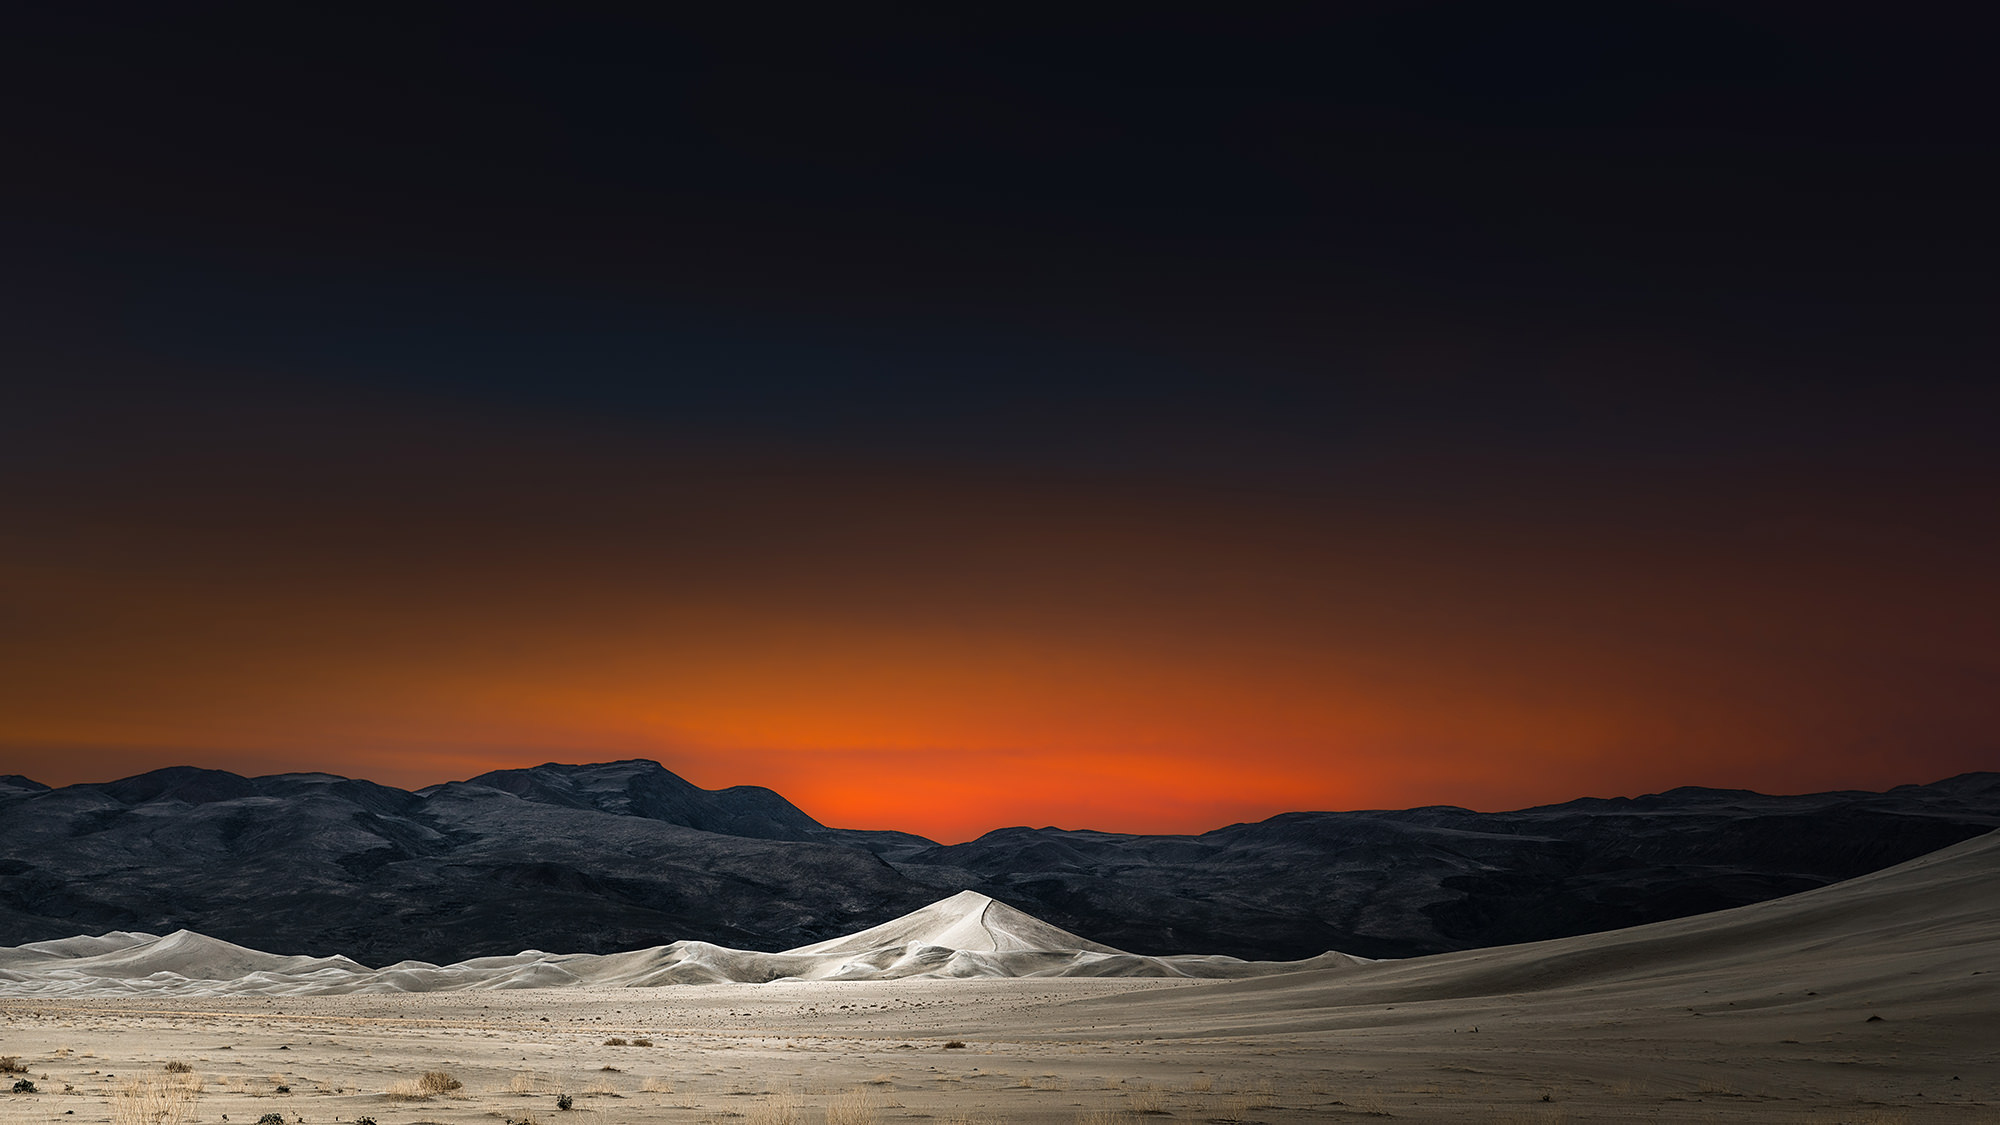 EUREKA DUNES - Death Valley, CA